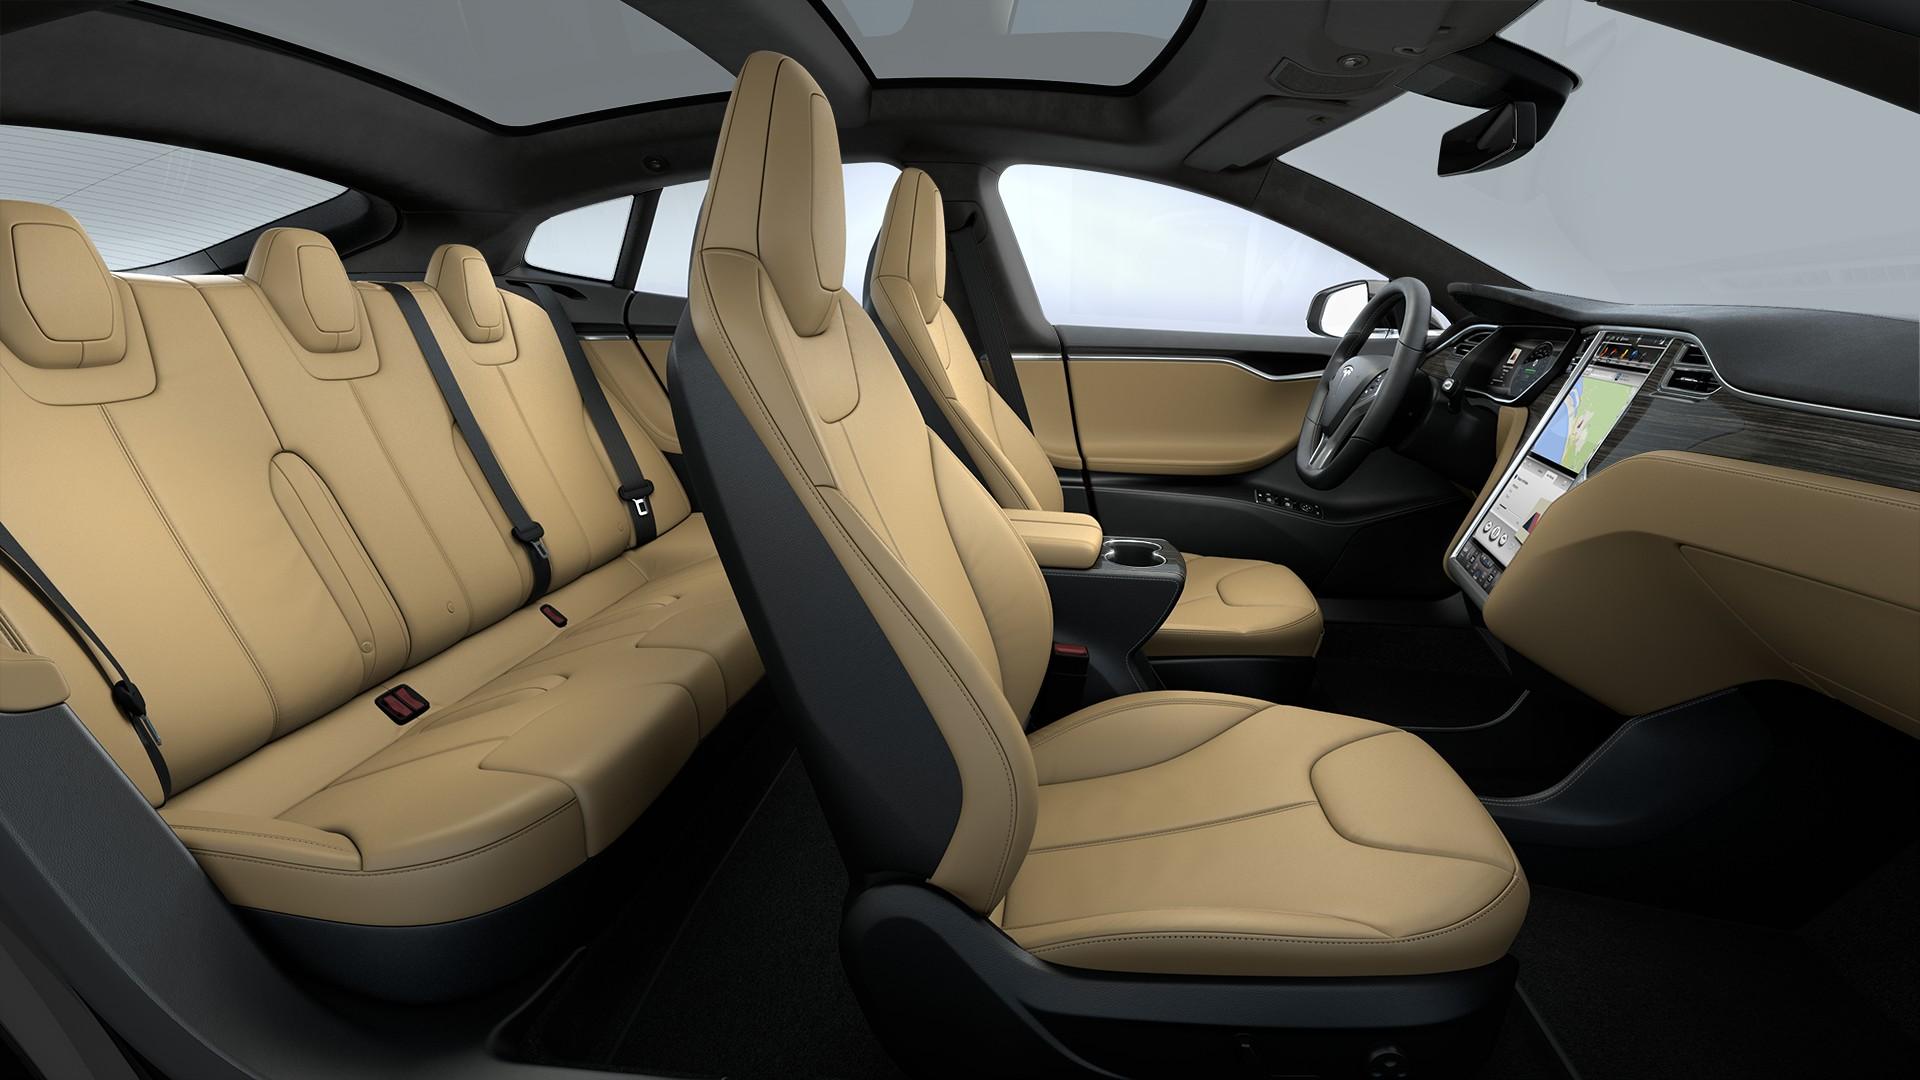 Interieur Tan Leather Seats Black Alcantara Headliner Alcantara Dashboard Accents